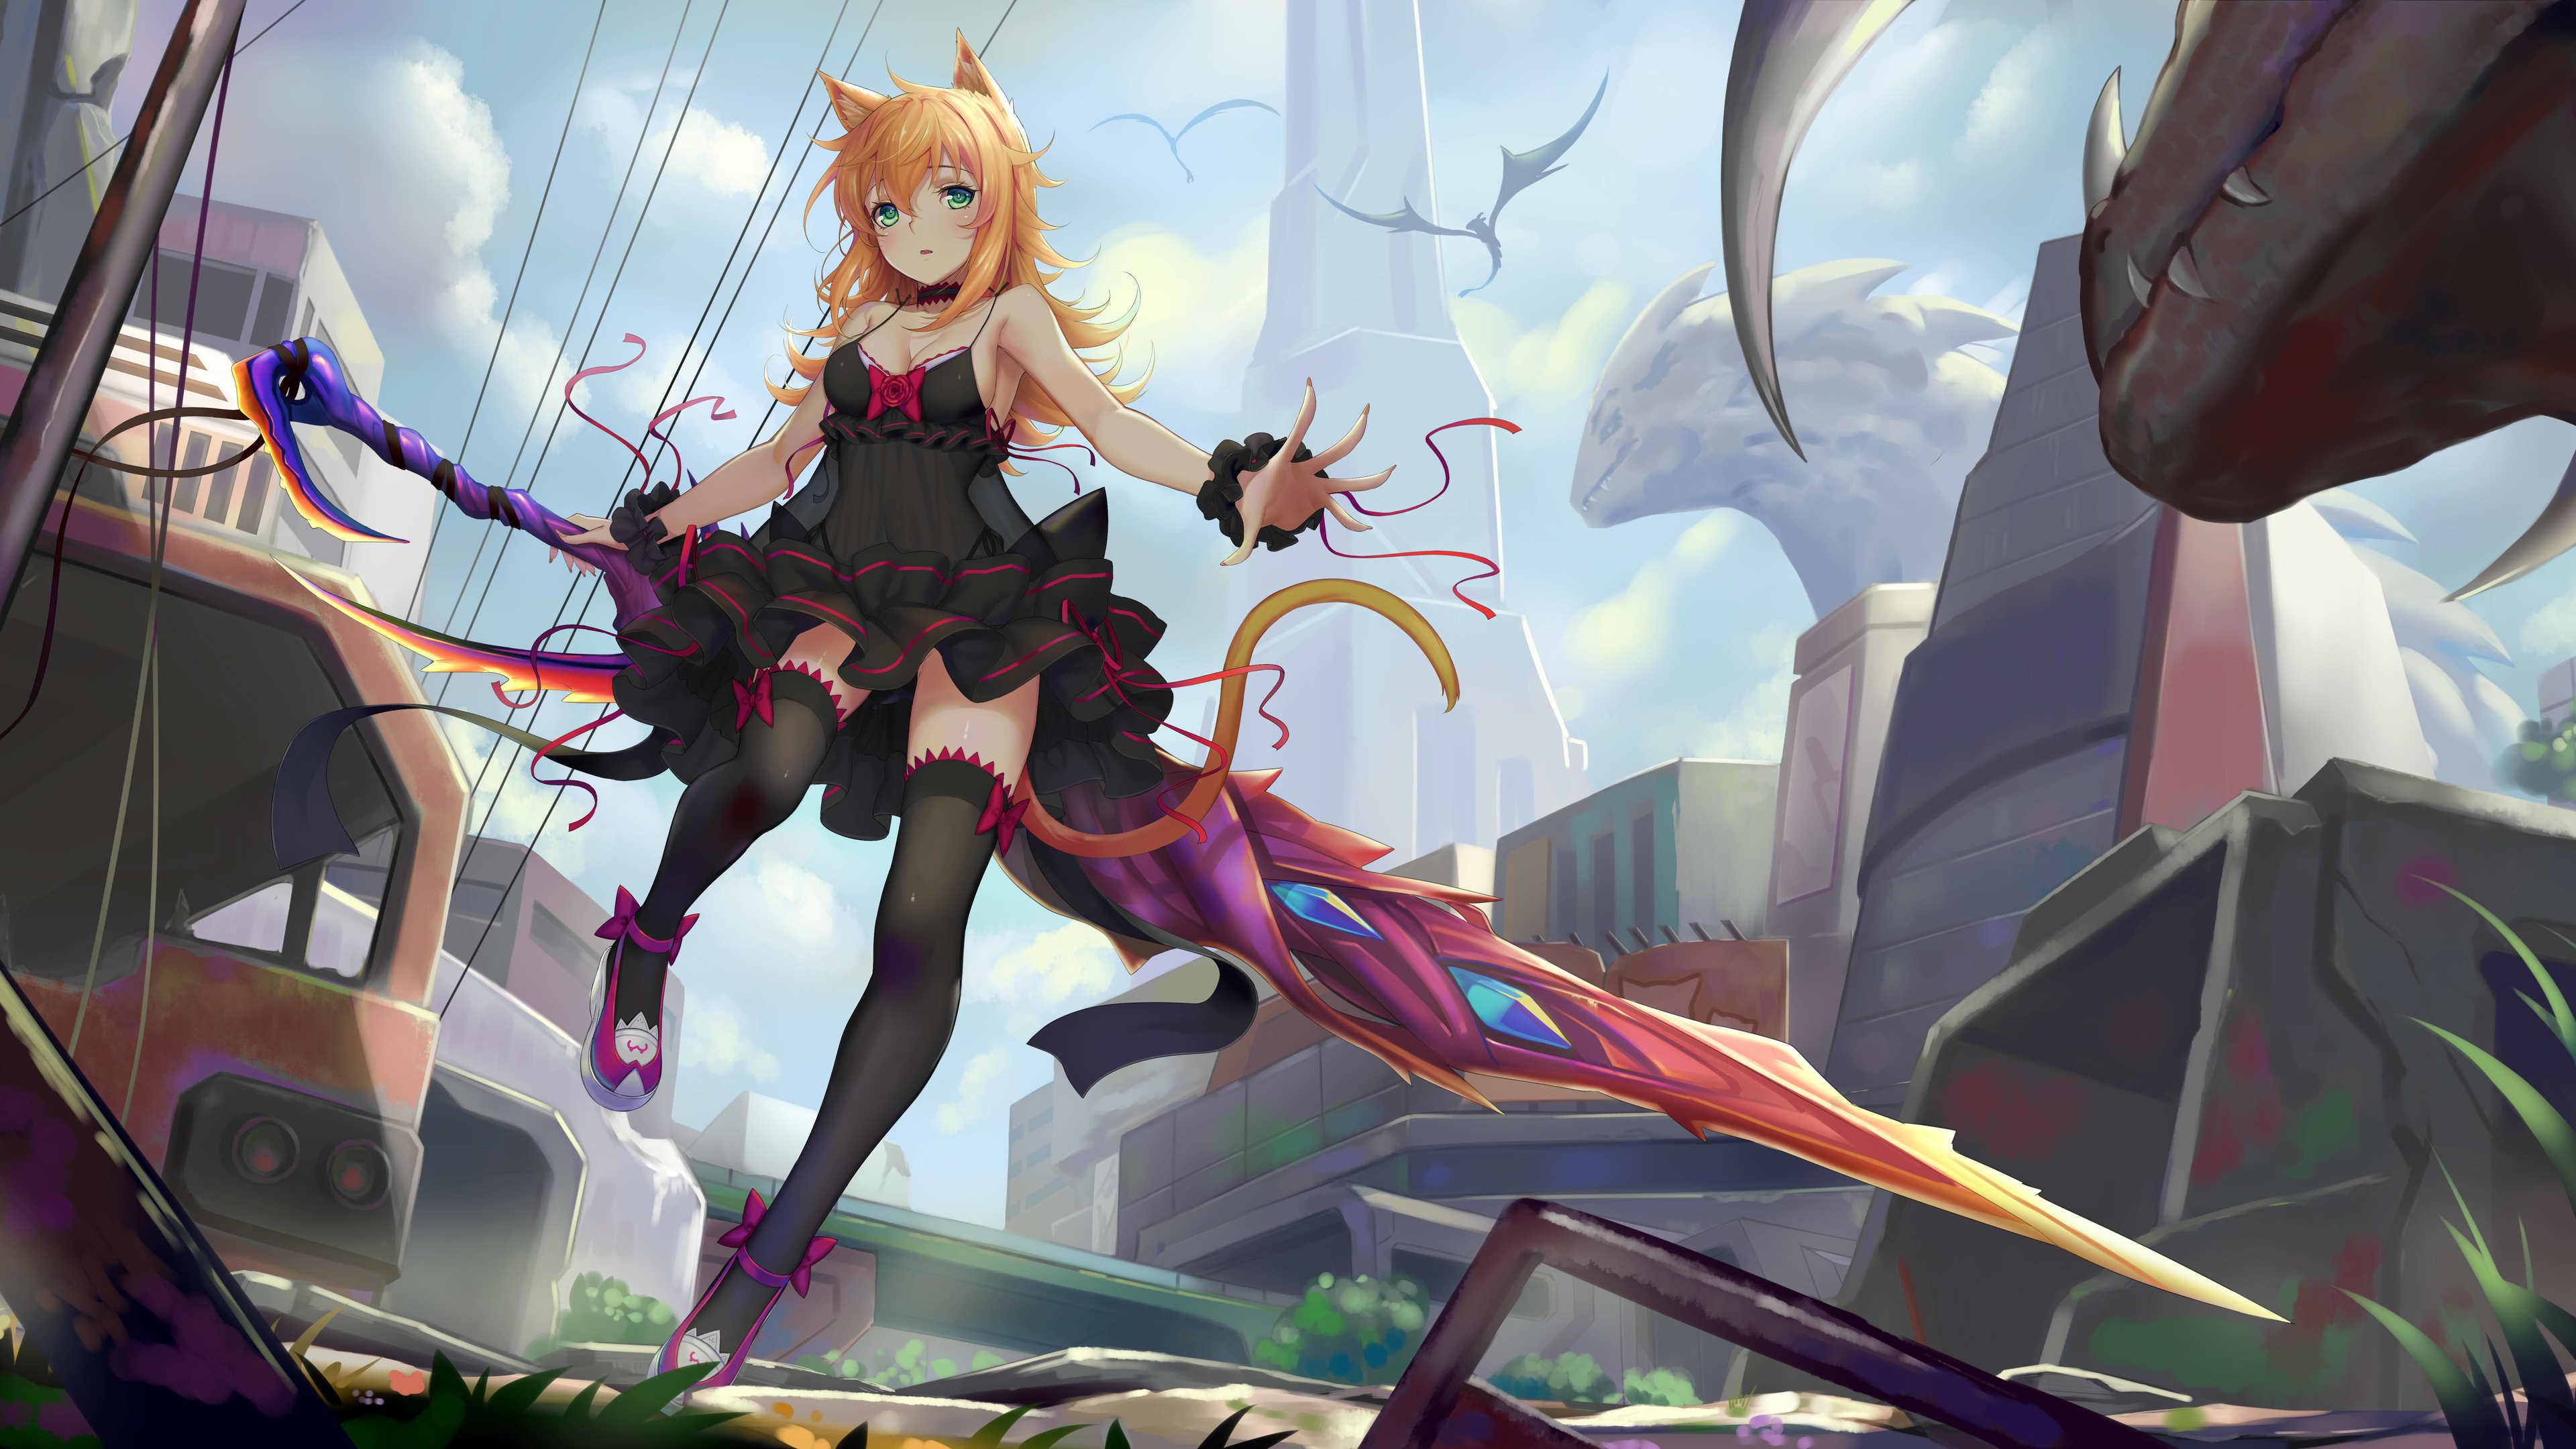 anime women sword 4k 1541974296 - Anime Women Sword 4k - hd-wallpapers, digital art wallpapers, artwork wallpapers, artist wallpapers, anime wallpapers, anime girl wallpapers, 4k-wallpapers